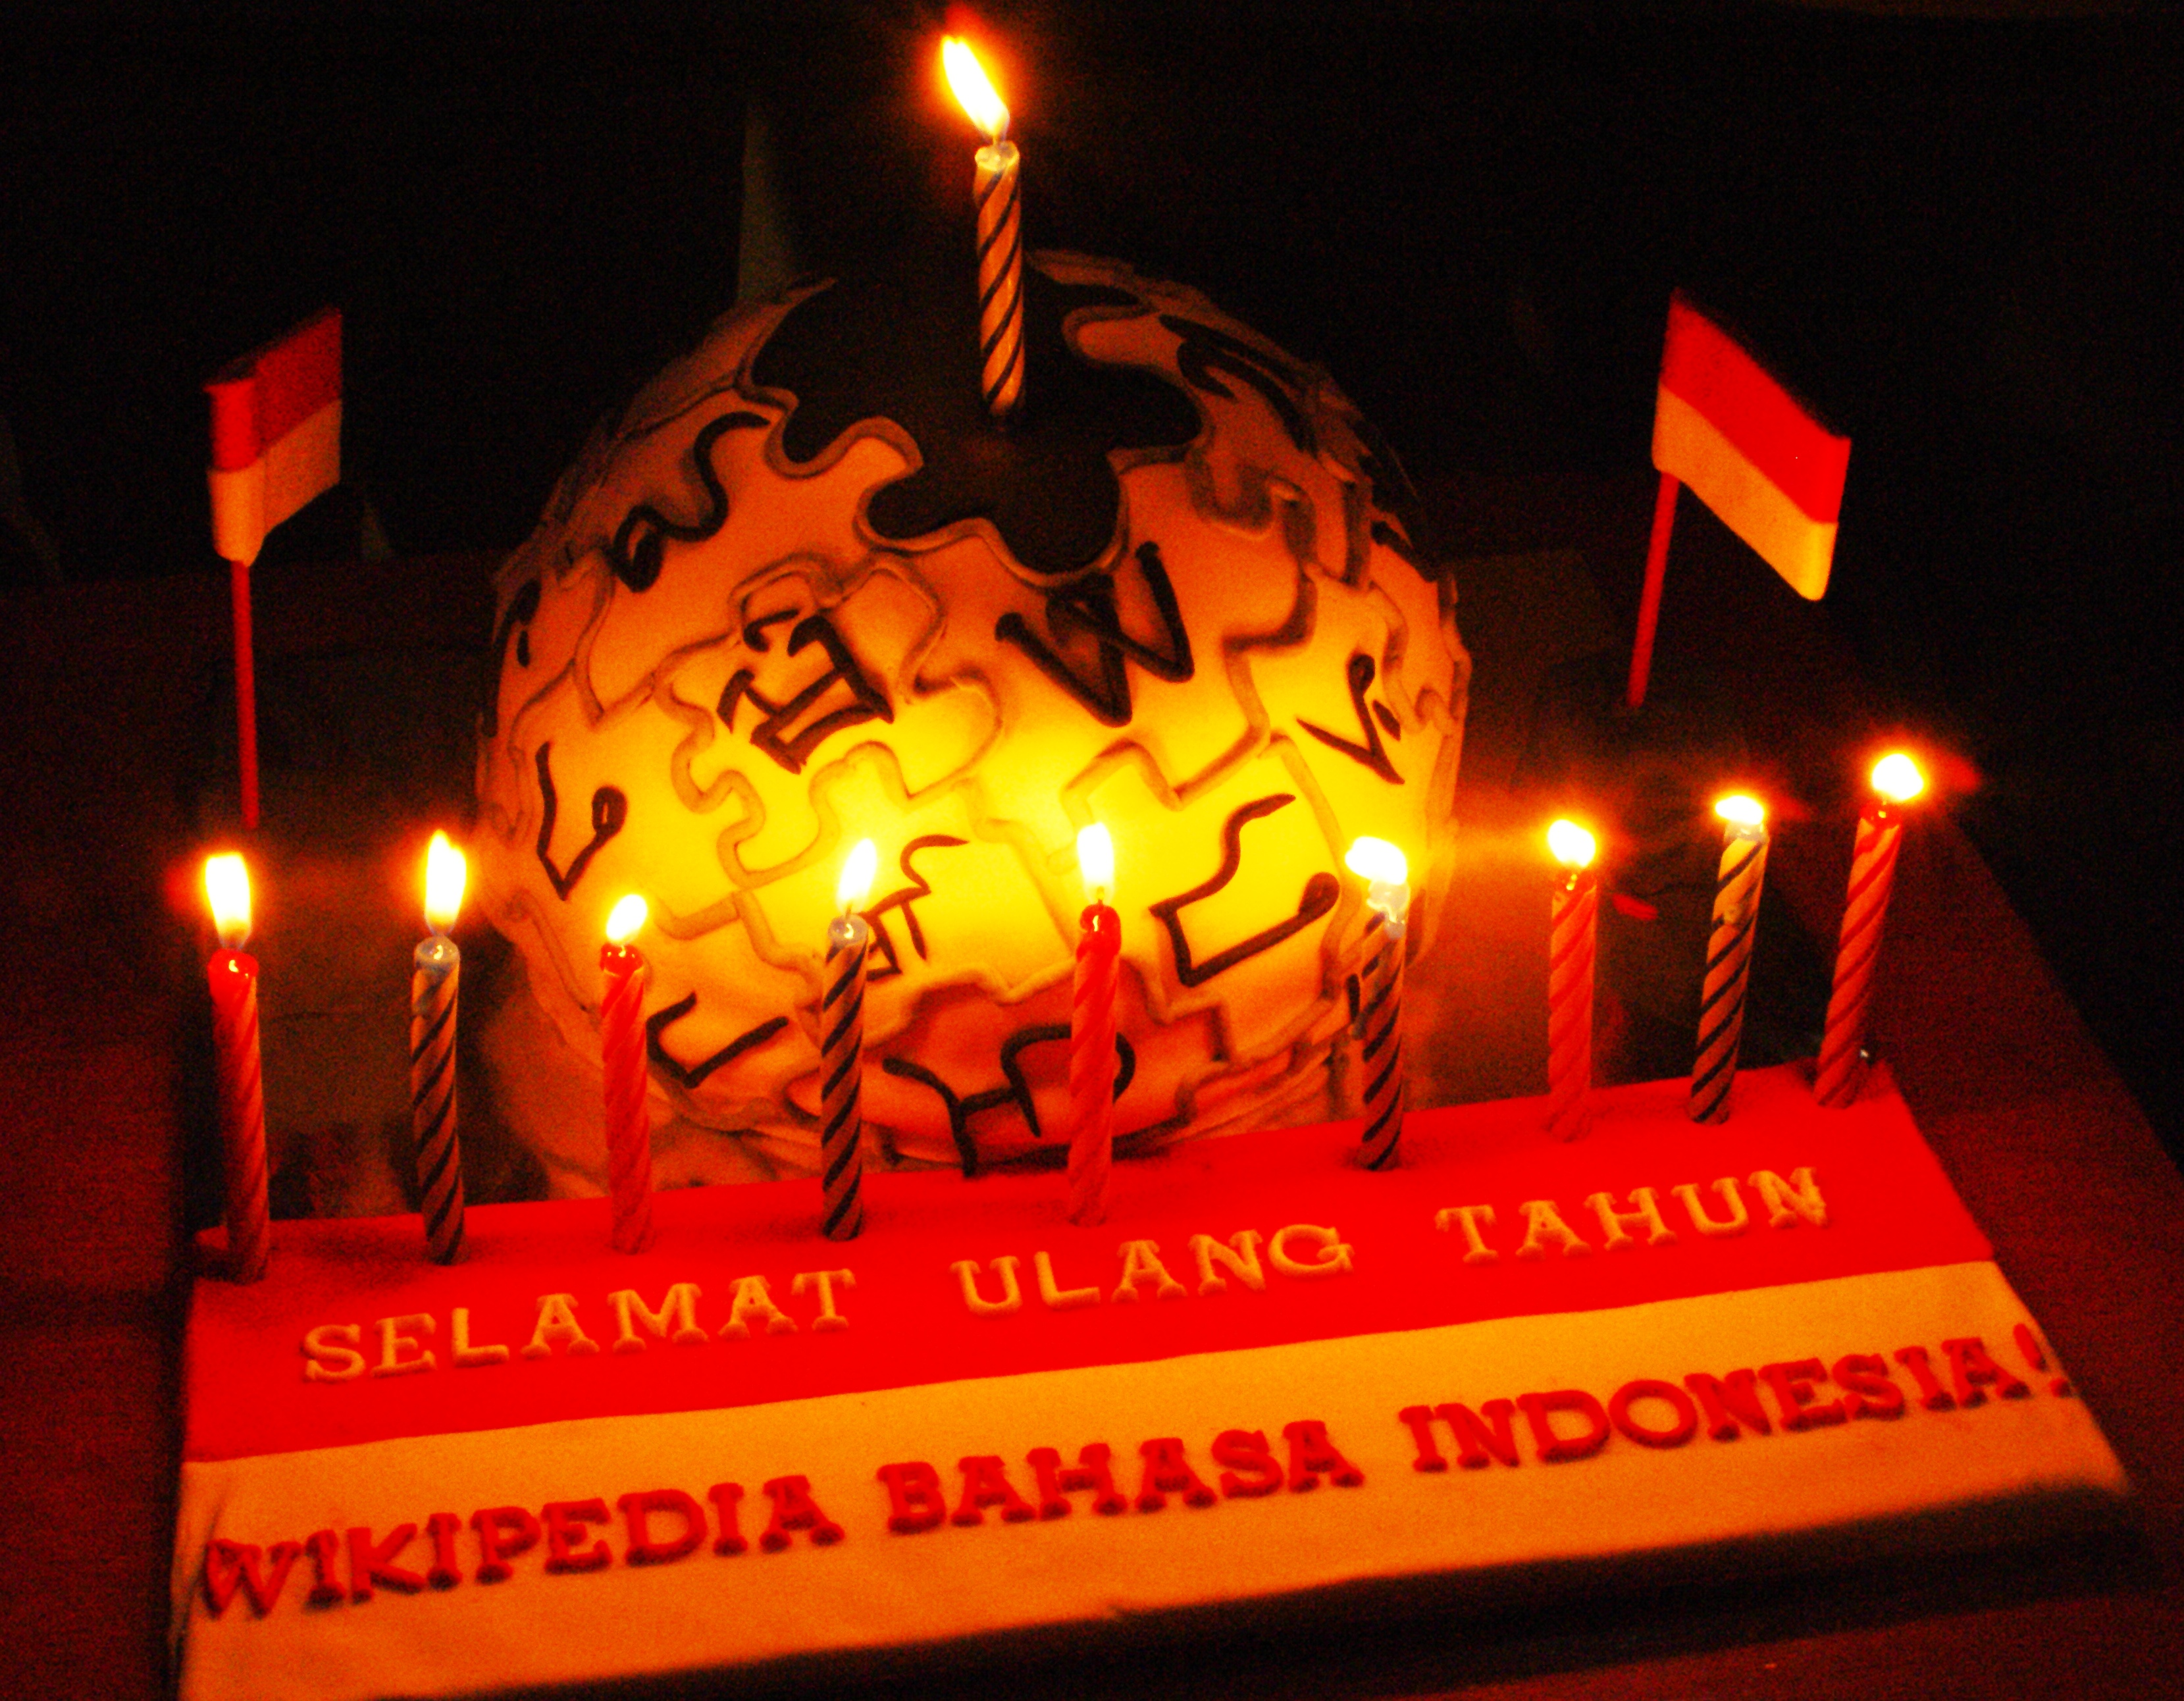 FileWikipedia Indonesia birthday cakeJPG Wikimedia Commons